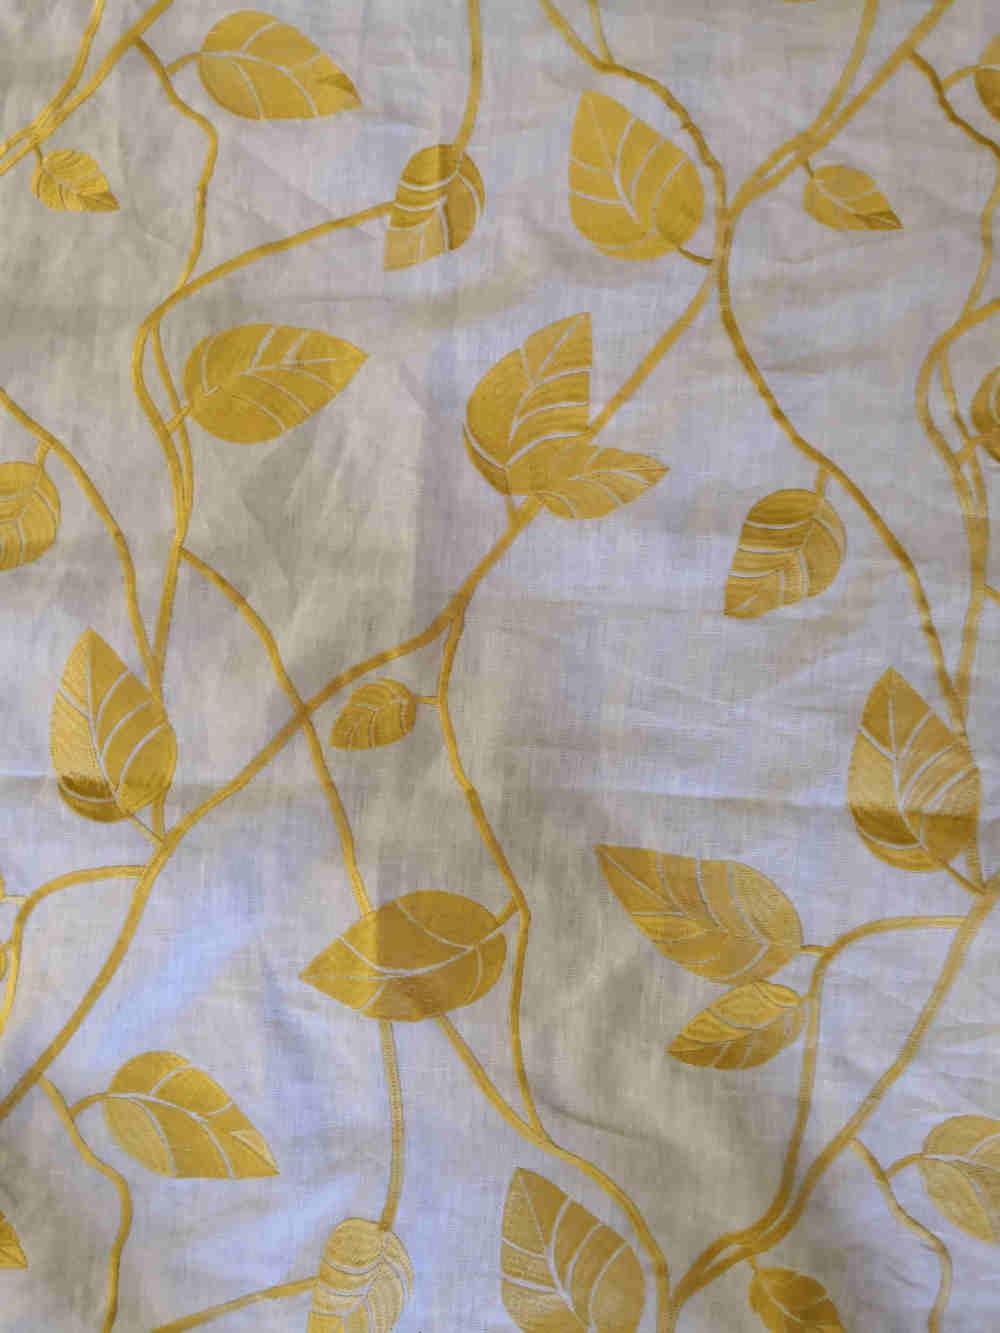 73.31368 Eltville yellow linen embroidert € 49.50